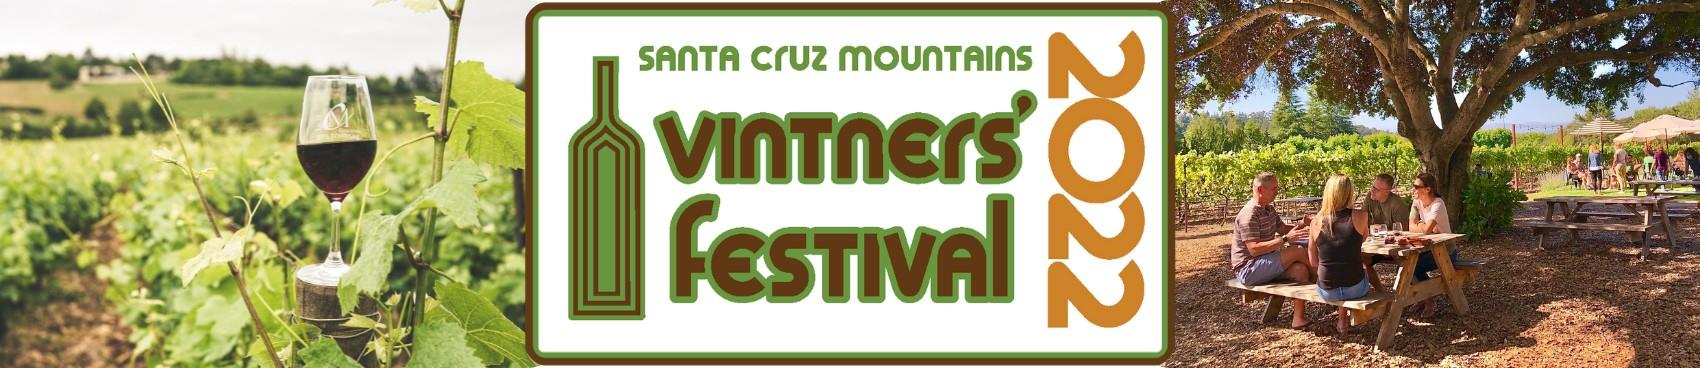 Wines of the Santa Cruz Mountains